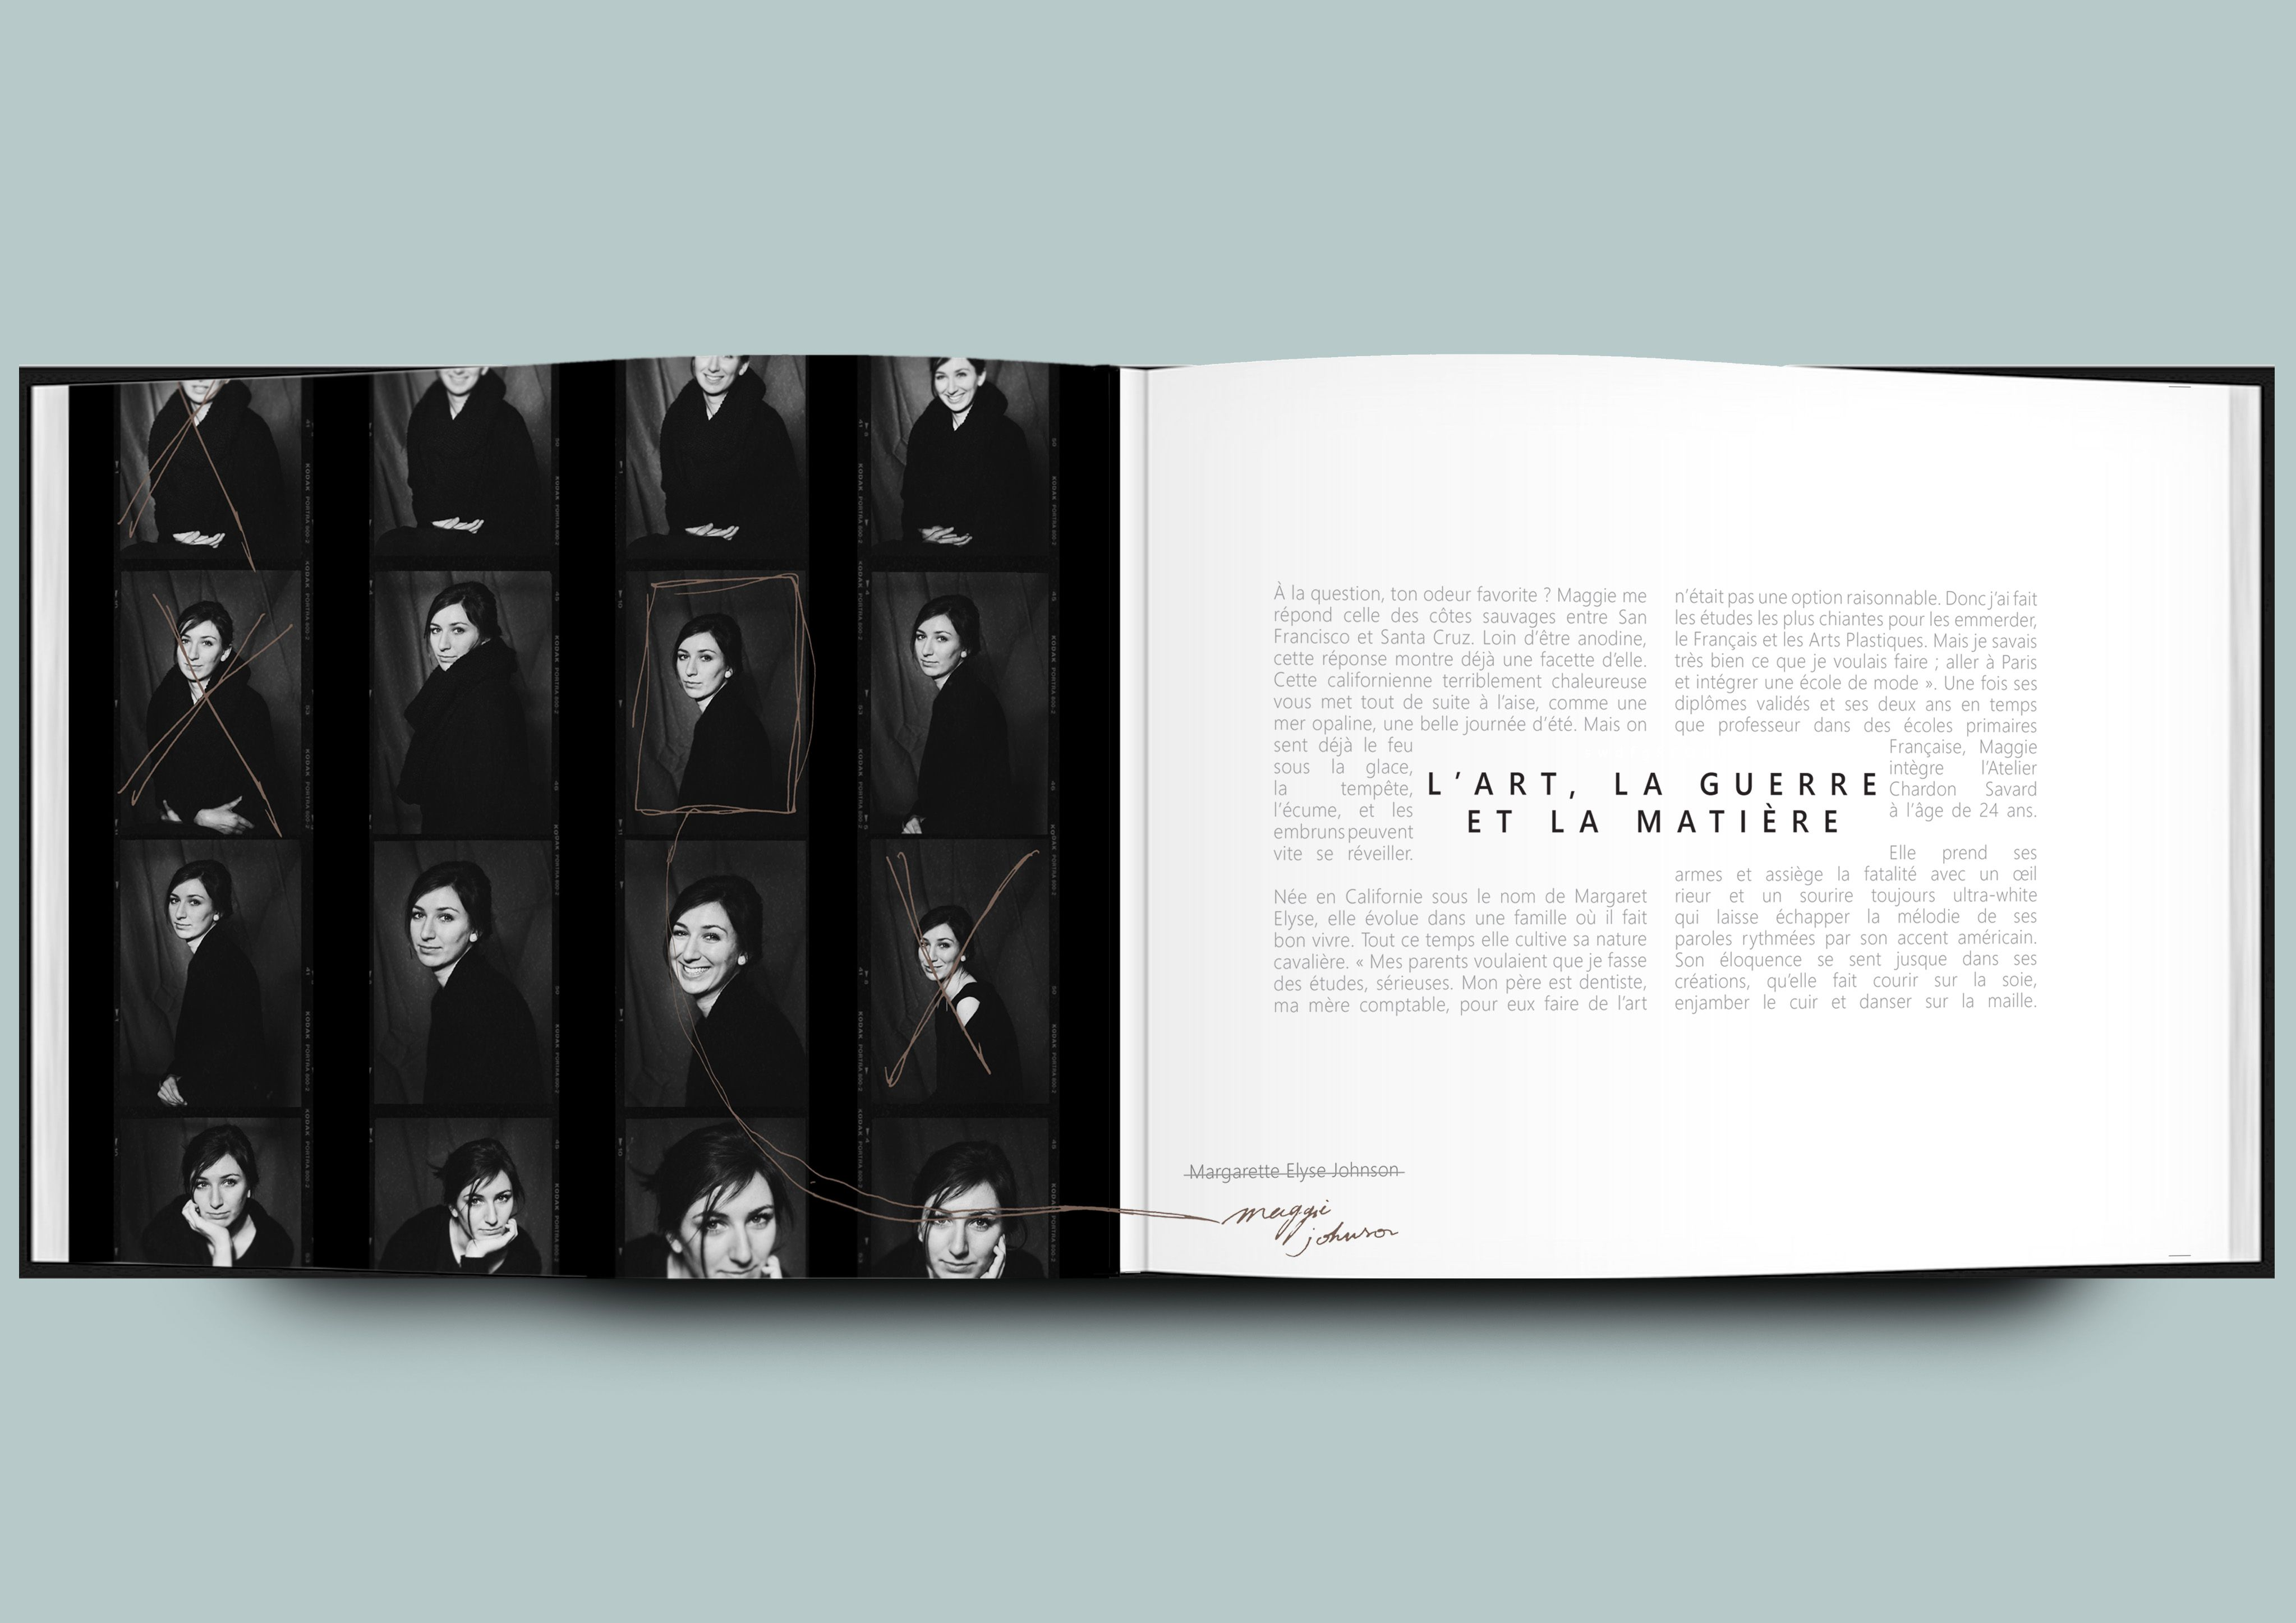 Layout fashion book by Maiwenn Nicolas